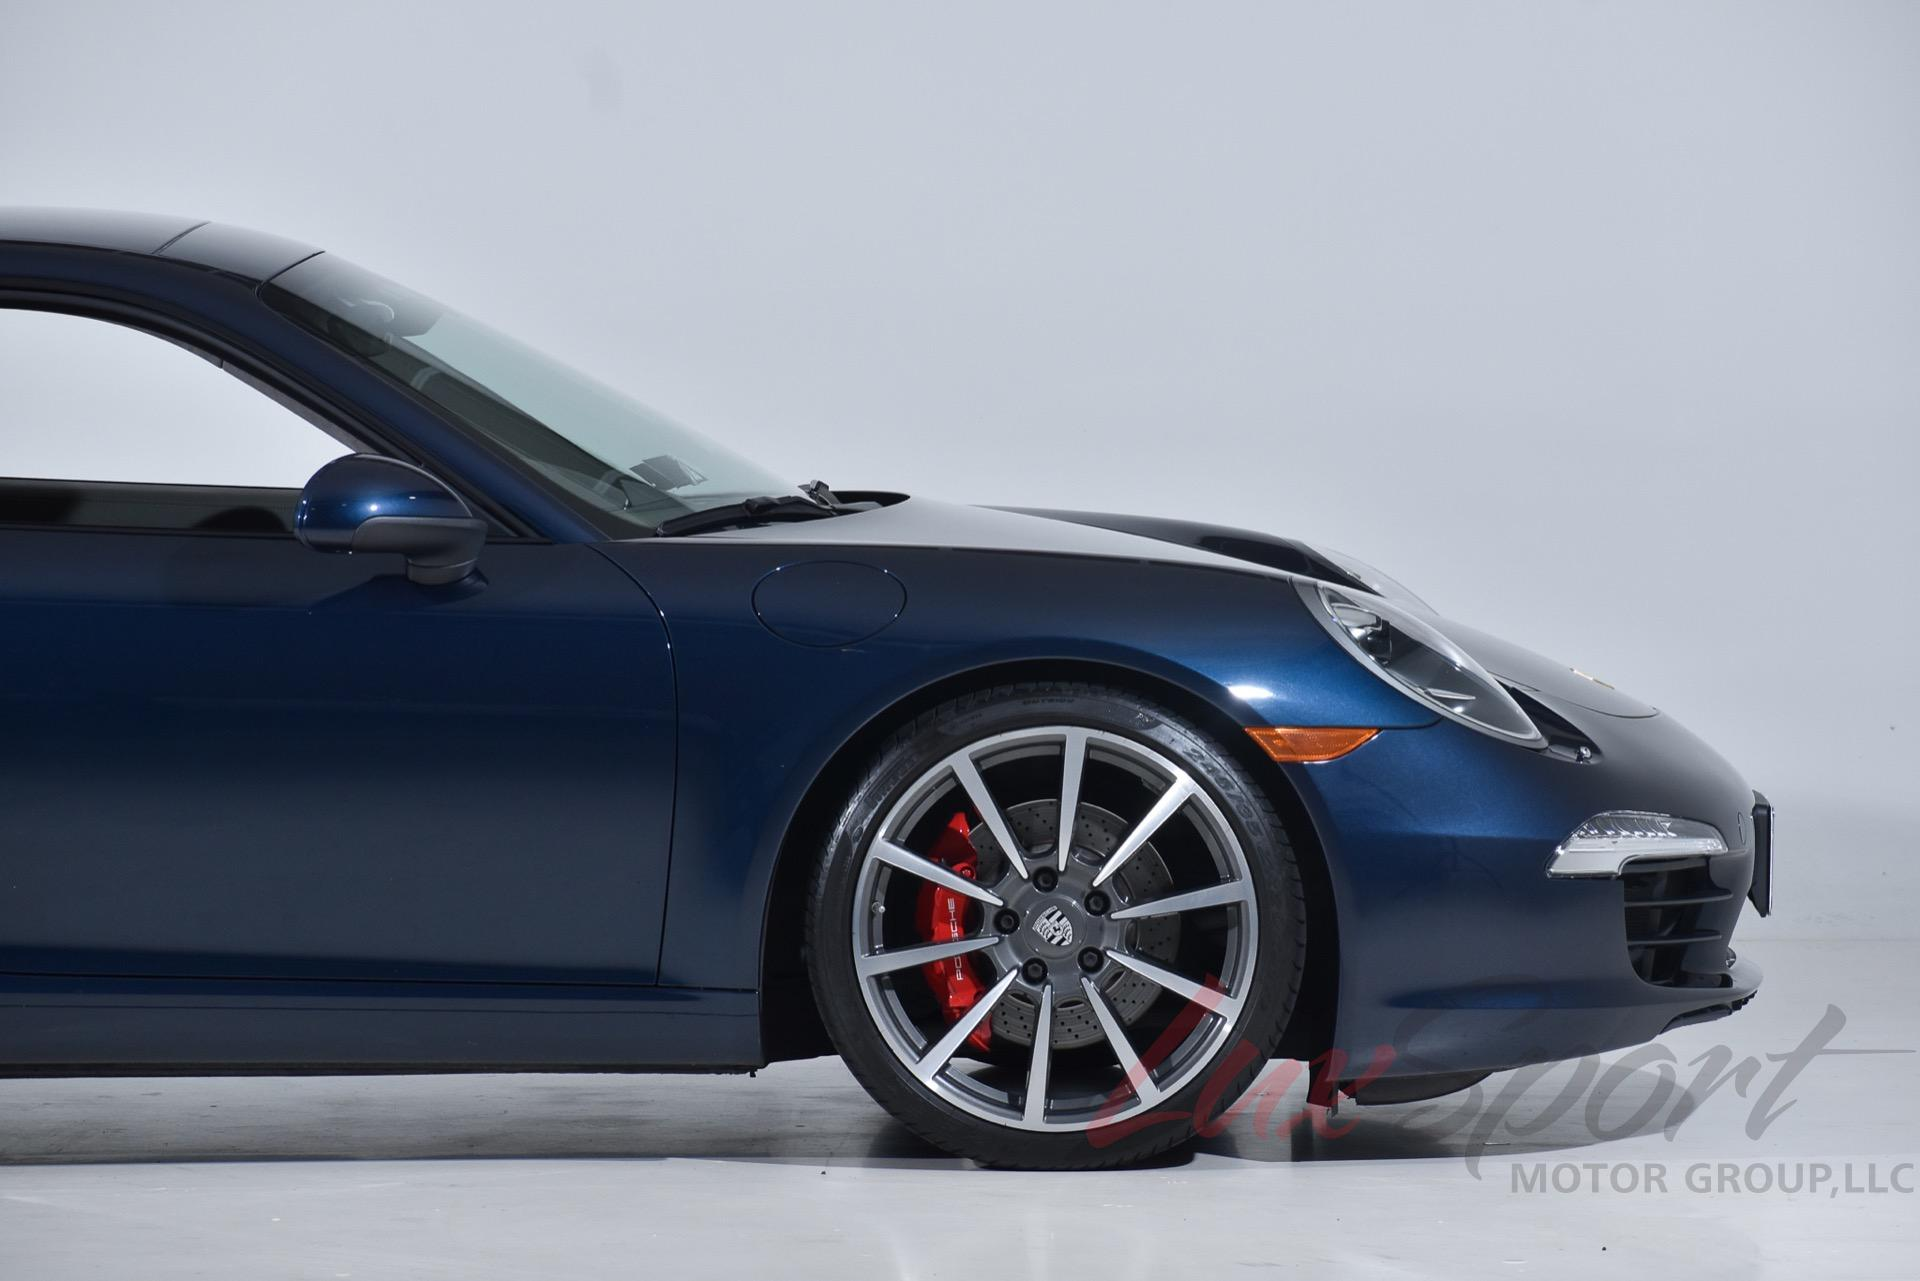 Used 2013 Porsche 997.2 Carrera S Coupe  | Syosset, NY